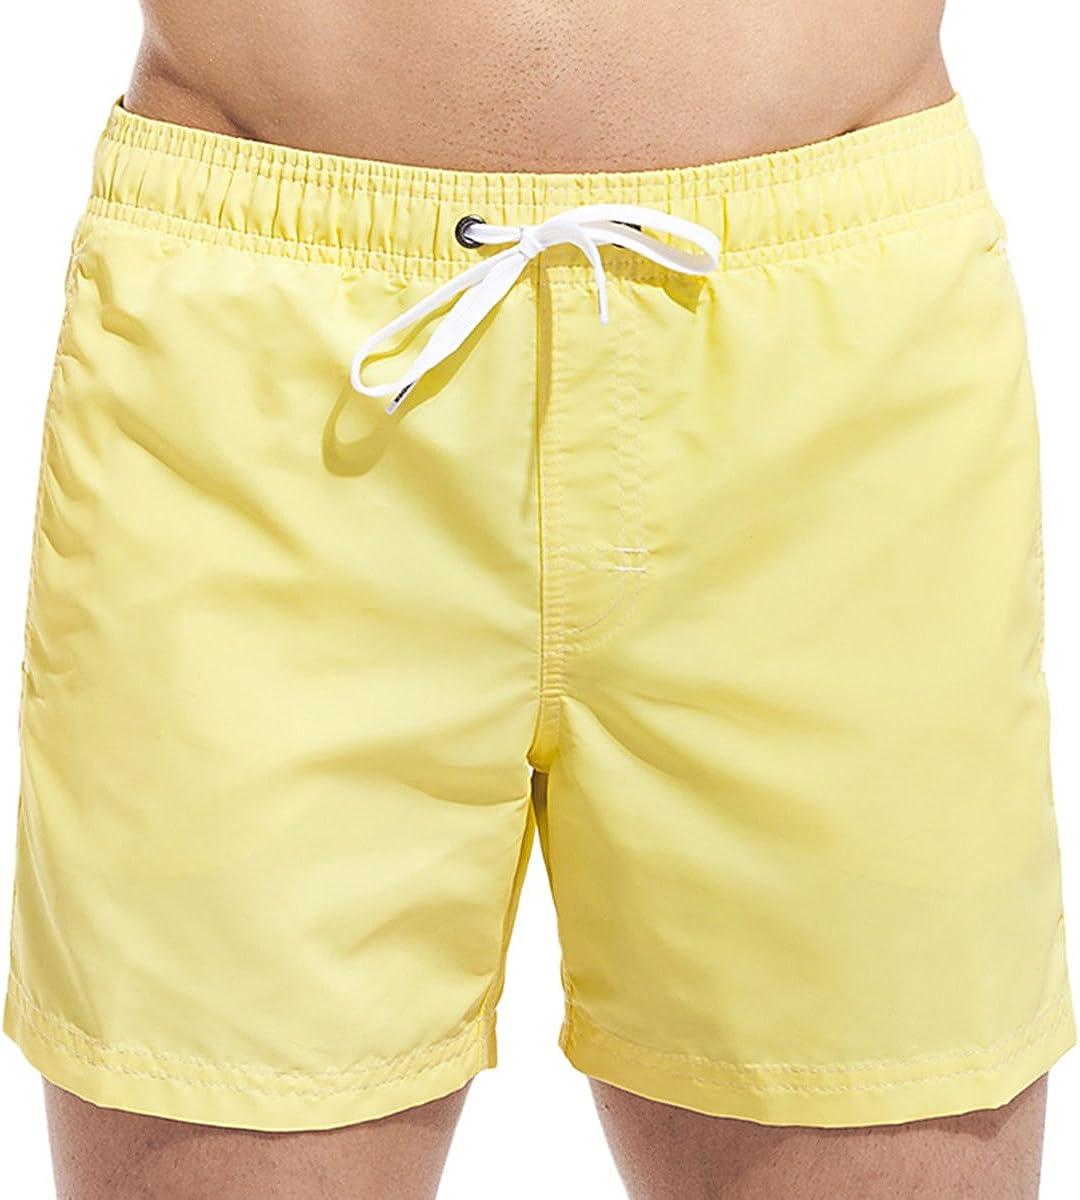 Sundek Arancio Pantaloncini da bagno Uomo 504